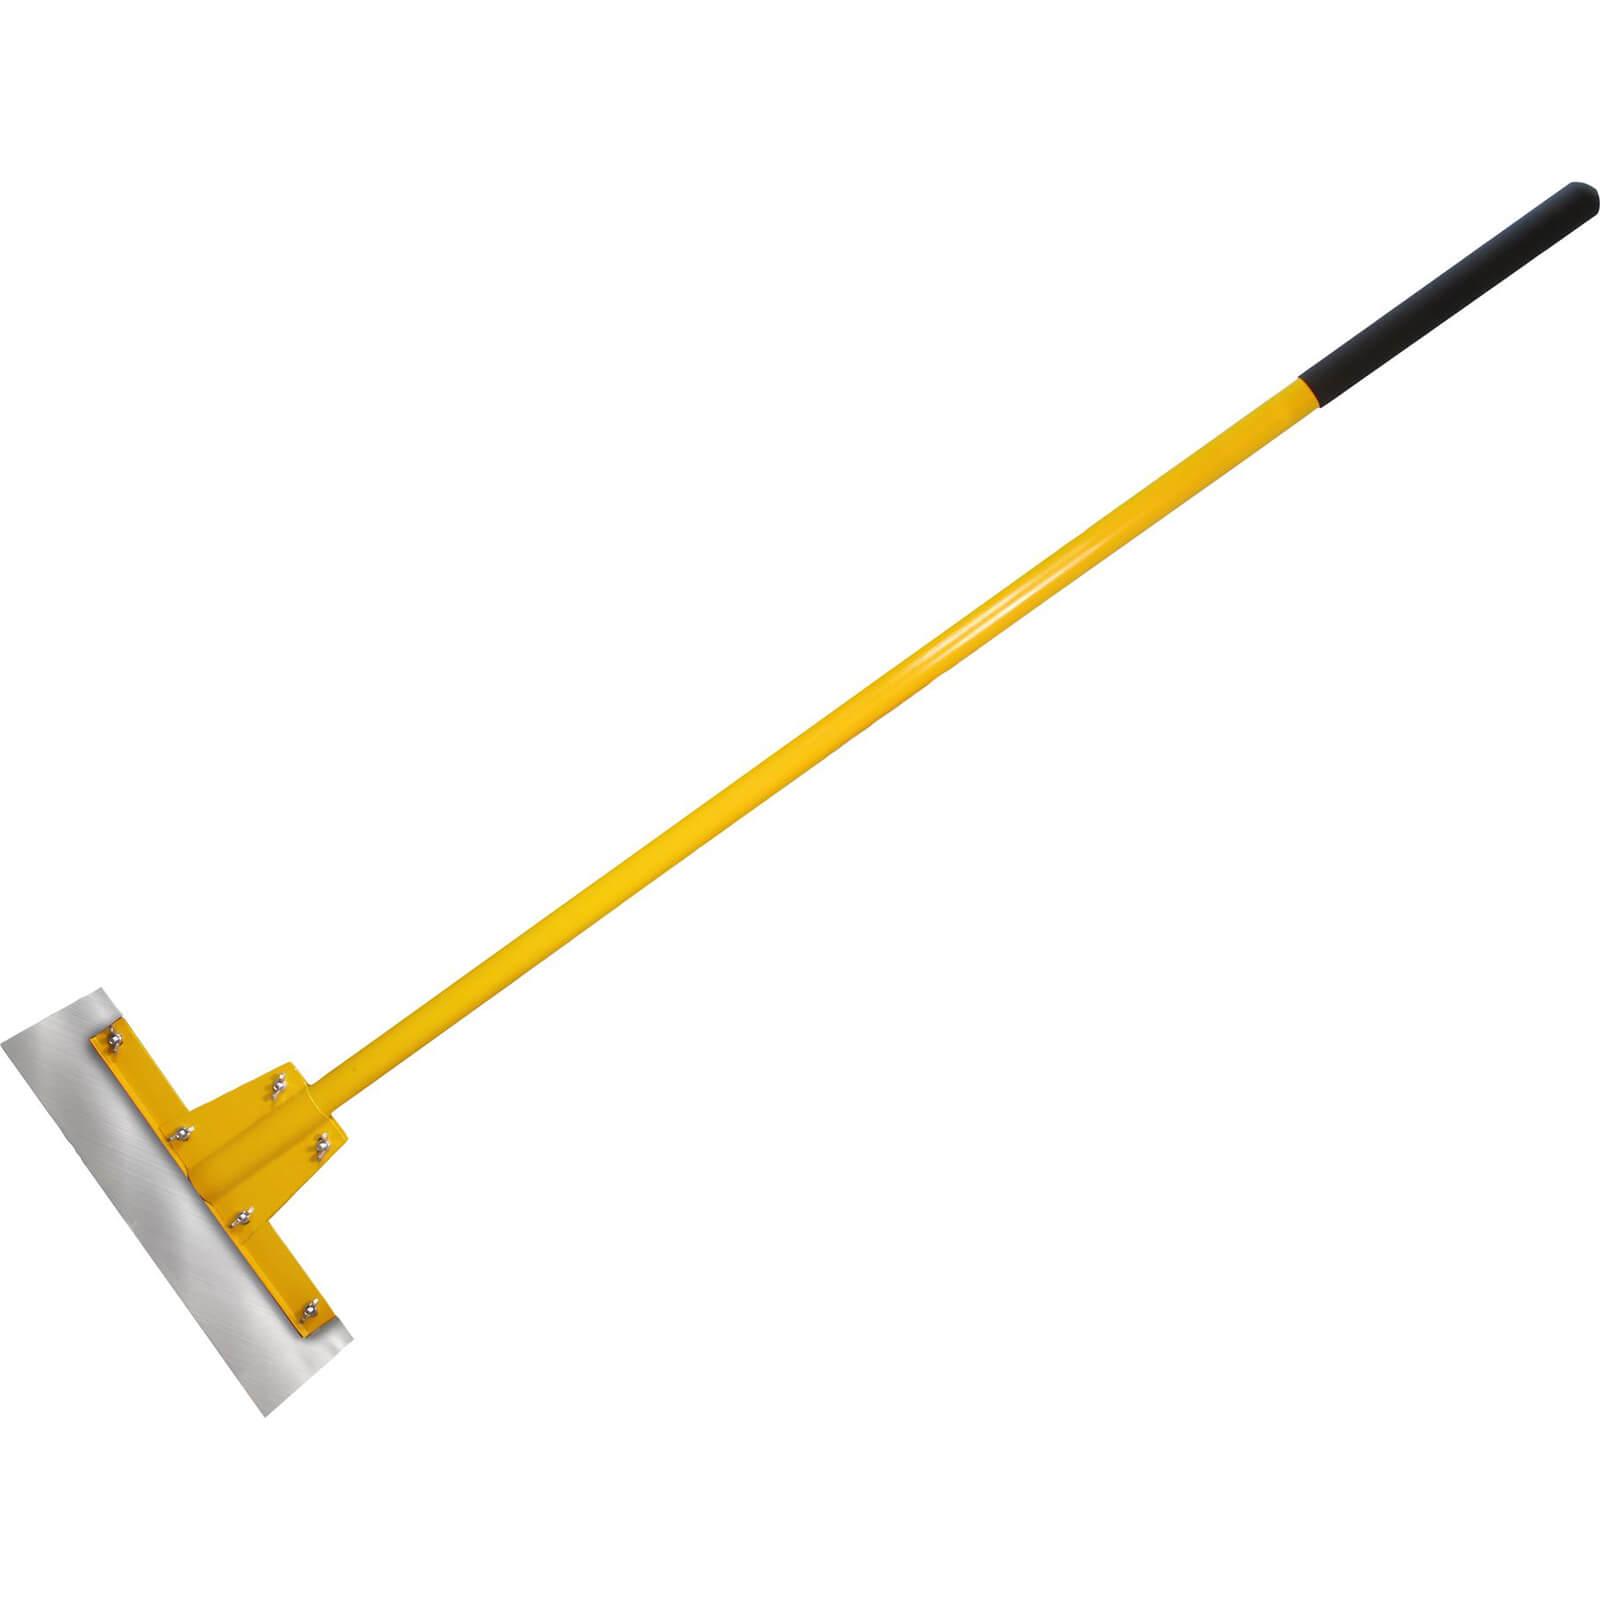 "Faithfull 16"" Floor Scraper With 48"" Heavy Duty Fibreglass Handle"